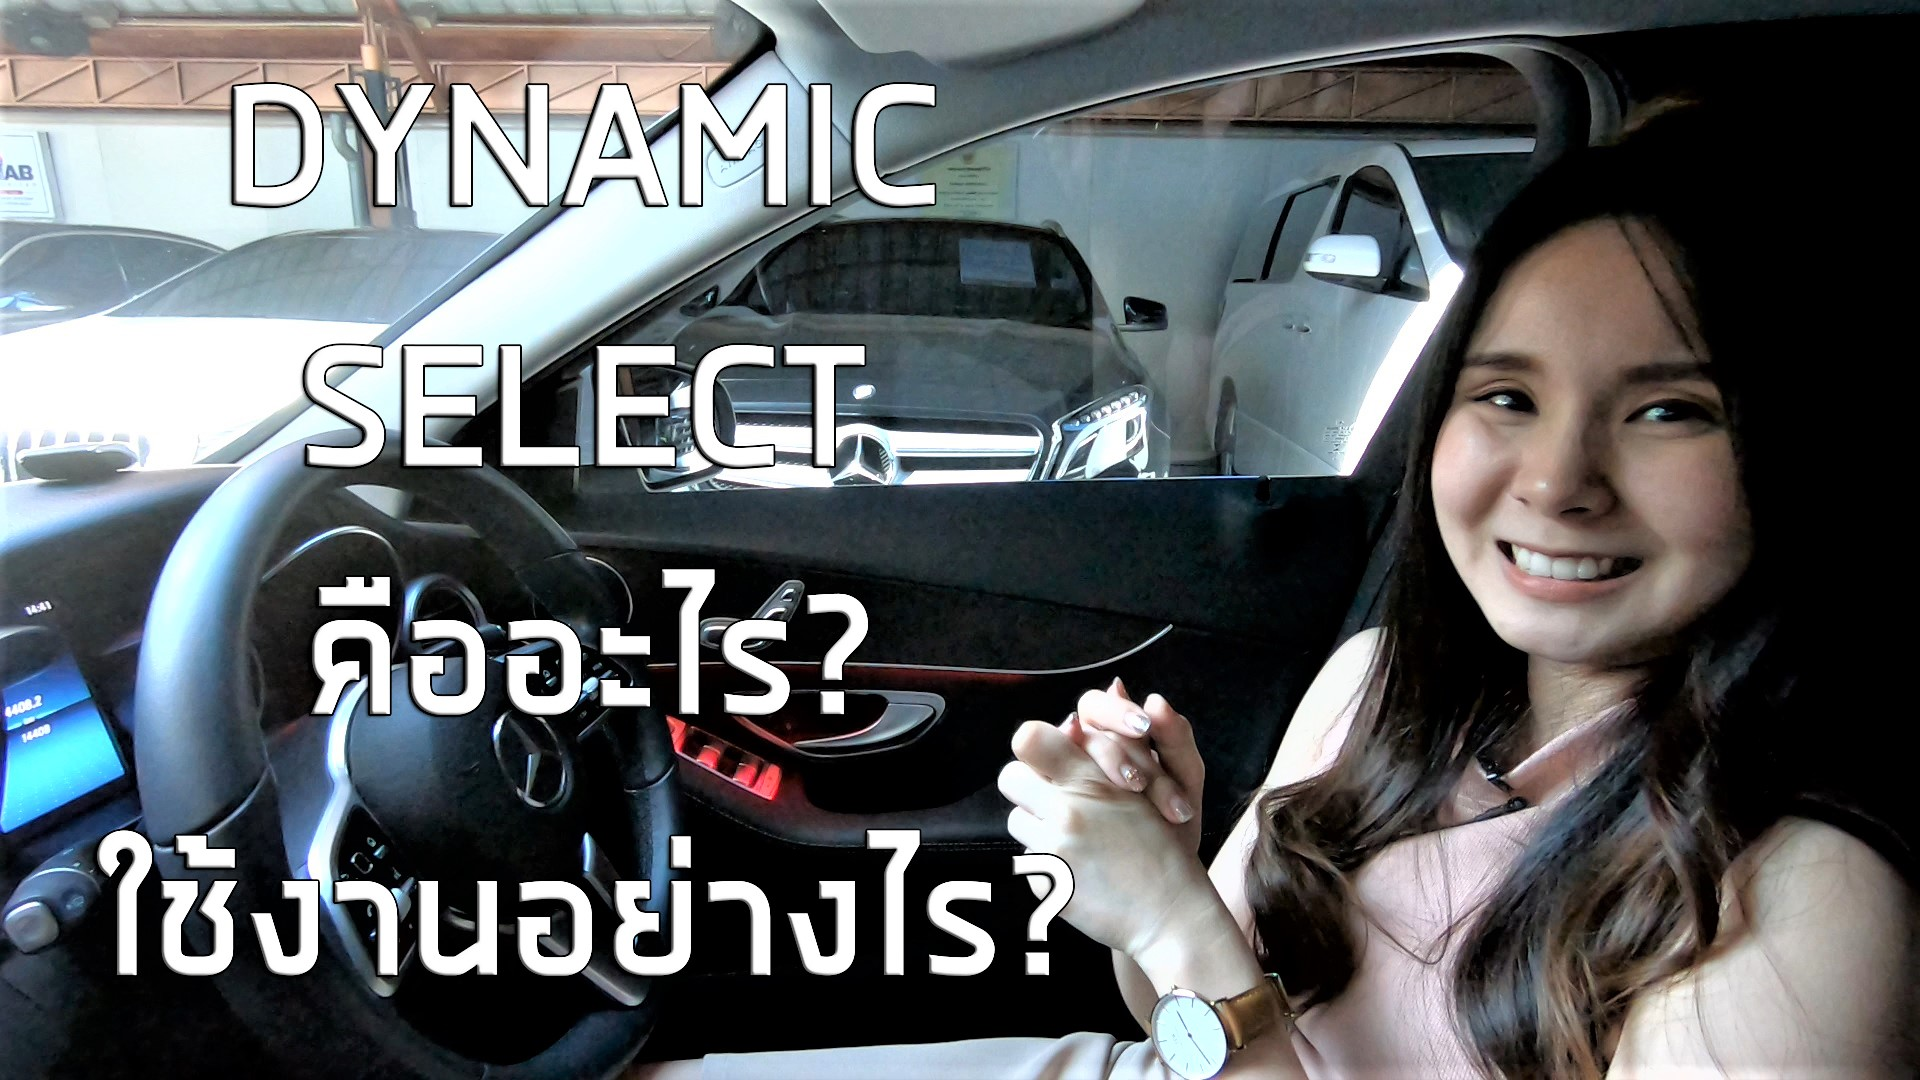 DYNAMIC SELECT คืออะไร ใช้งานอย่างไร?